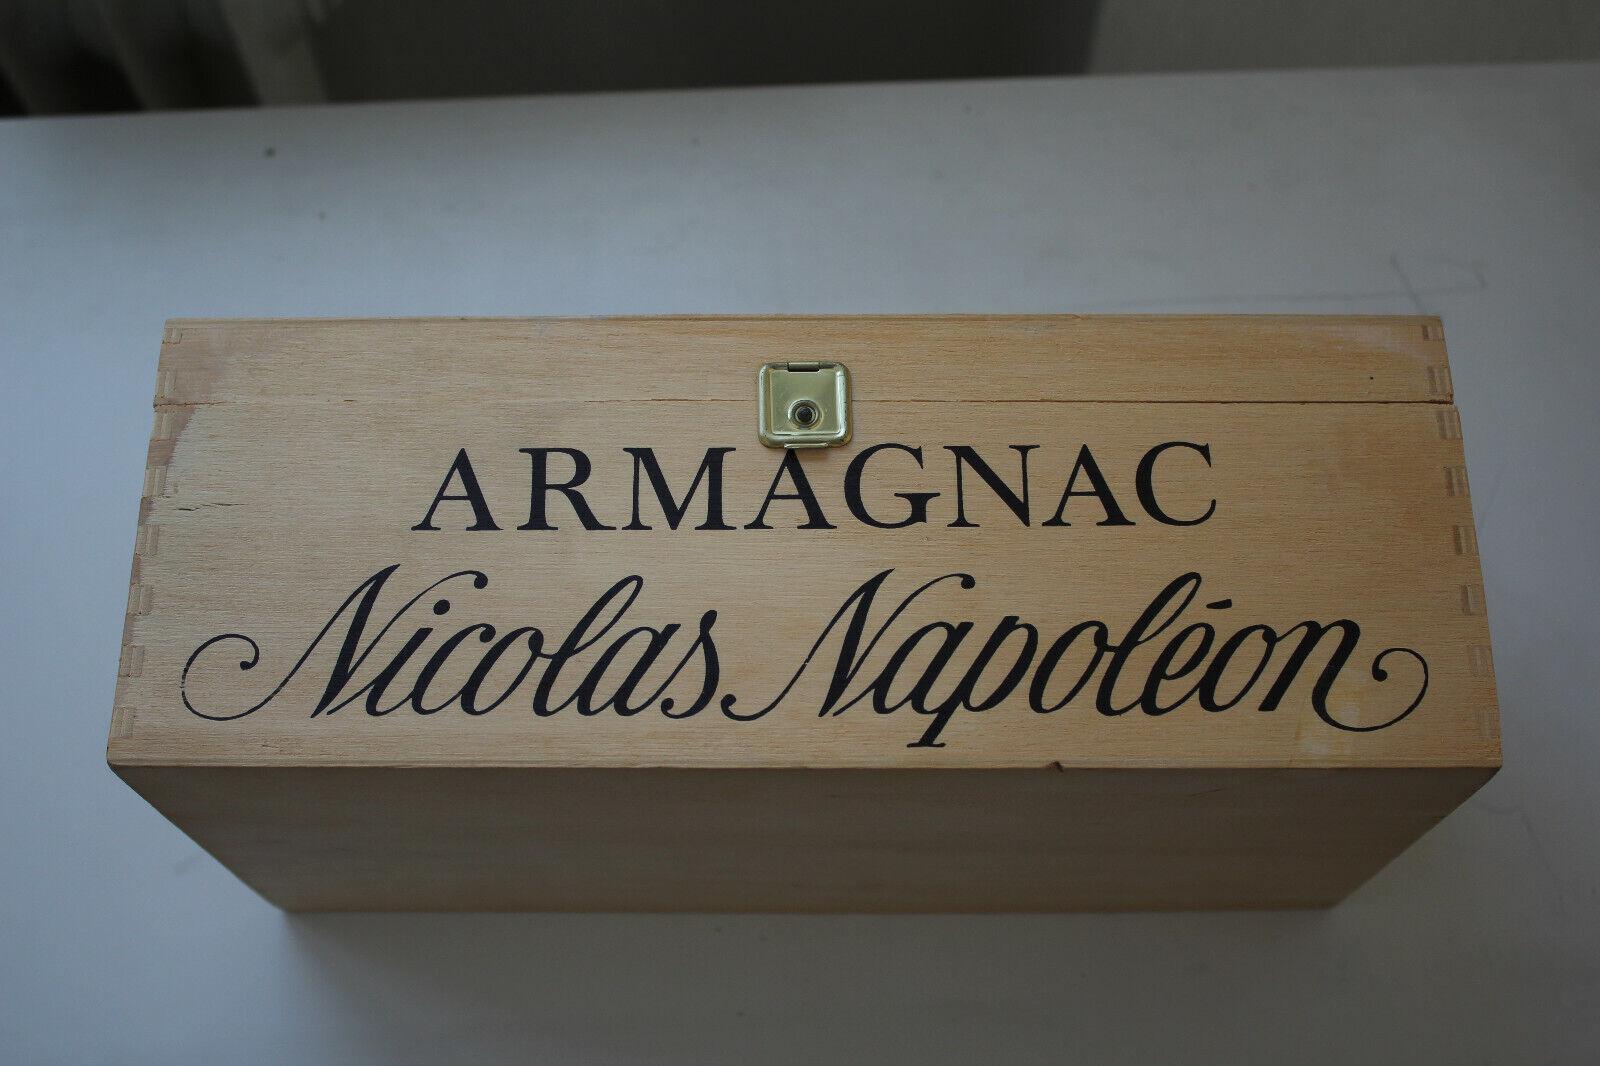 ARMAGNAC Napoleon 0,7l 40% ,Alt, Rarität, Kellerfund